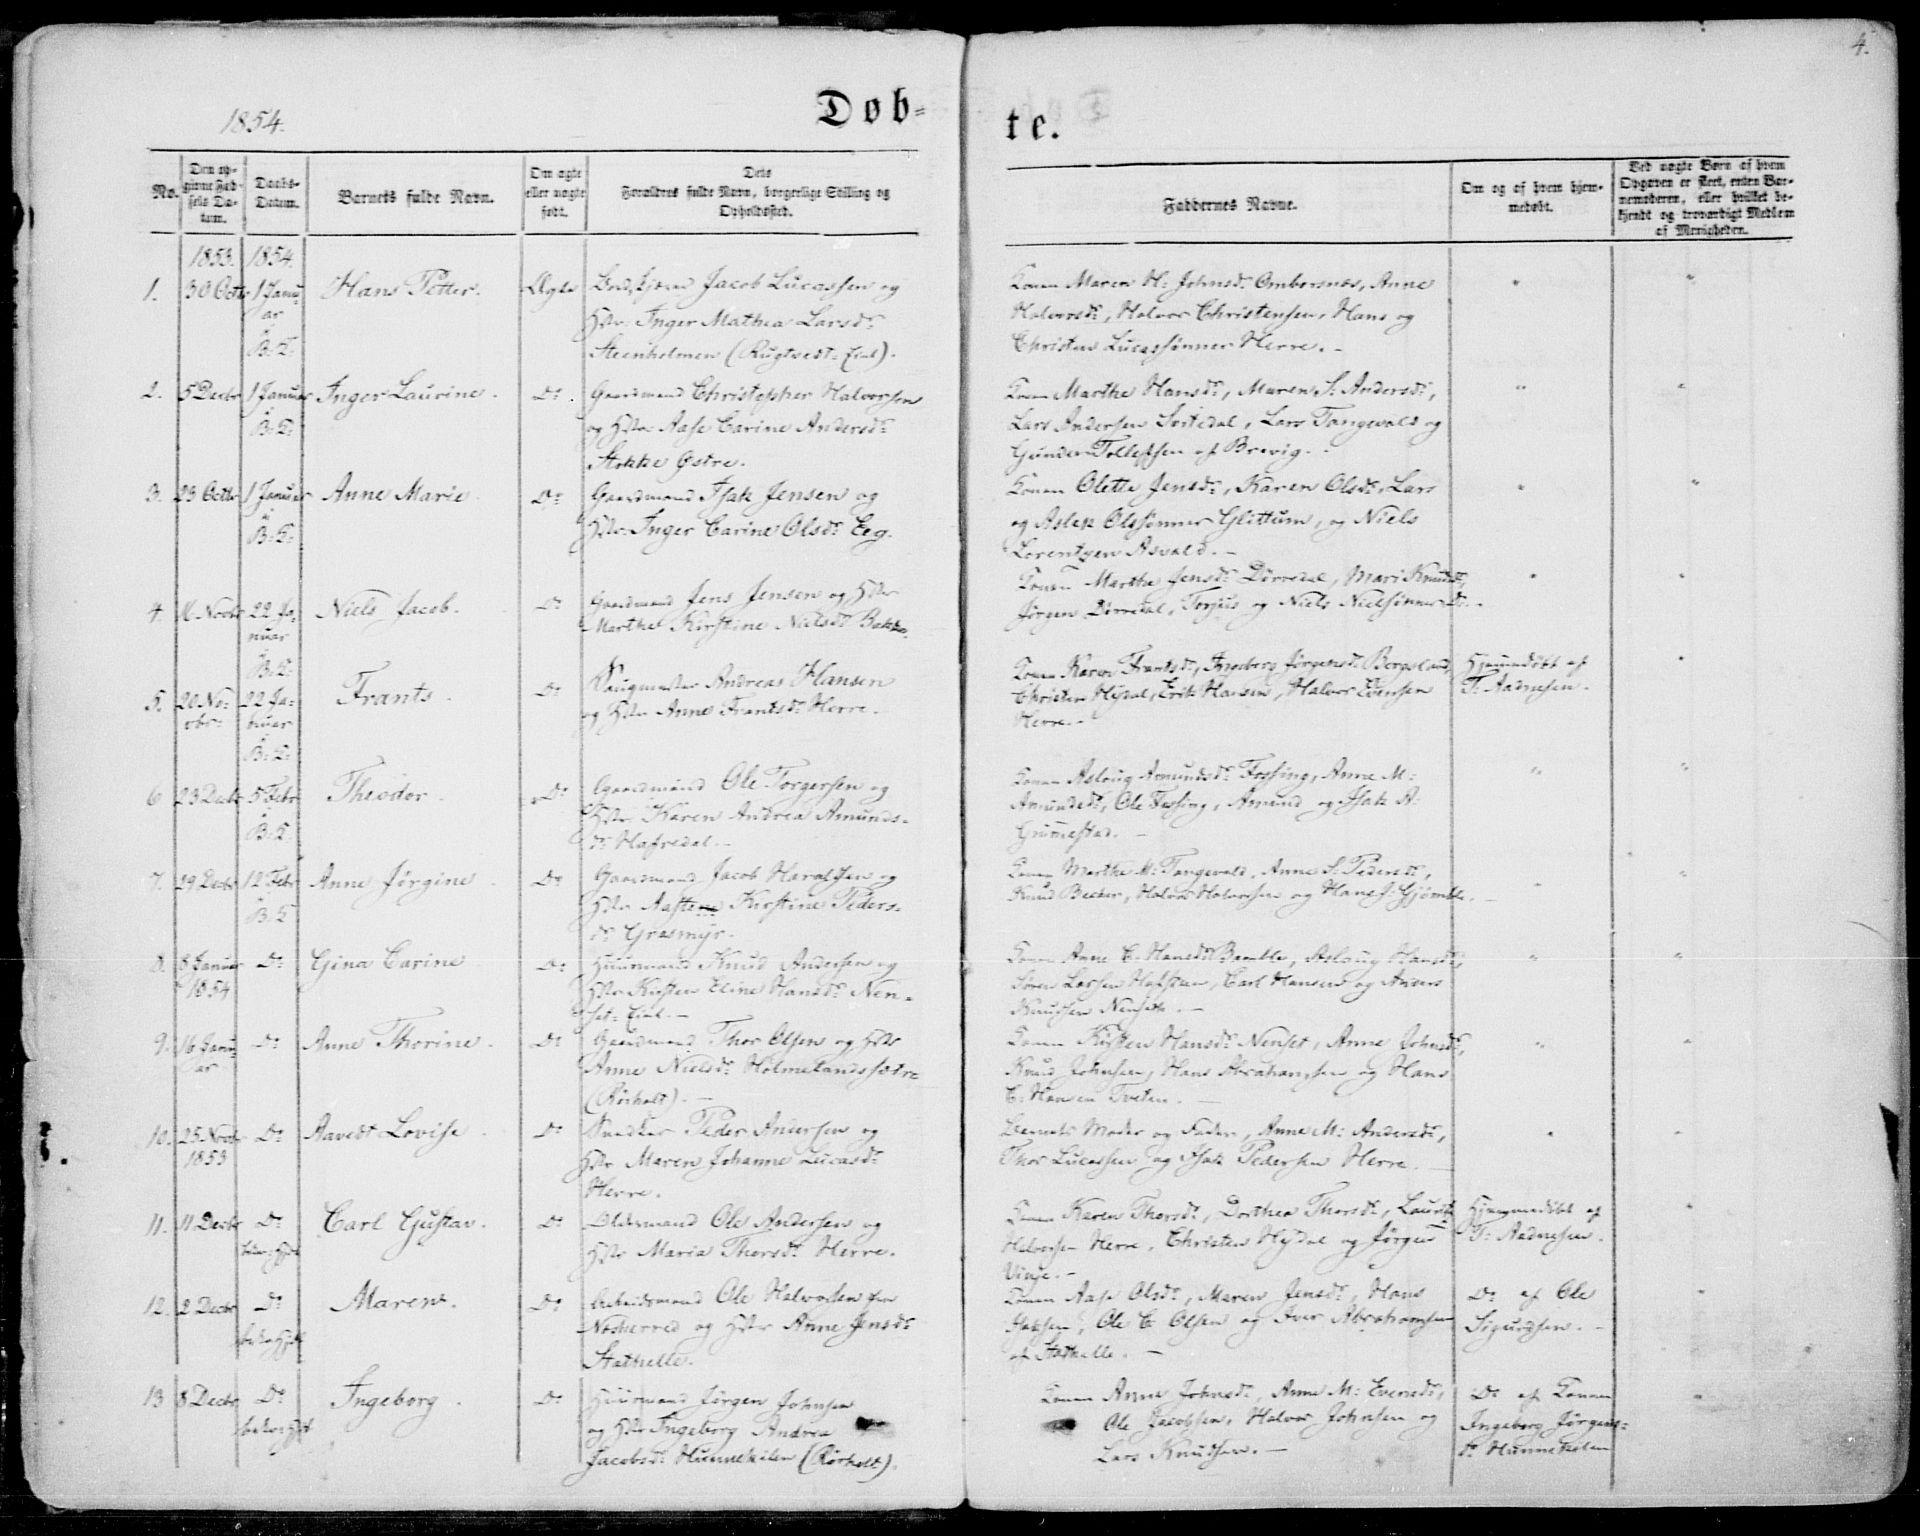 SAKO, Bamble kirkebøker, F/Fa/L0005: Ministerialbok nr. I 5, 1854-1869, s. 4